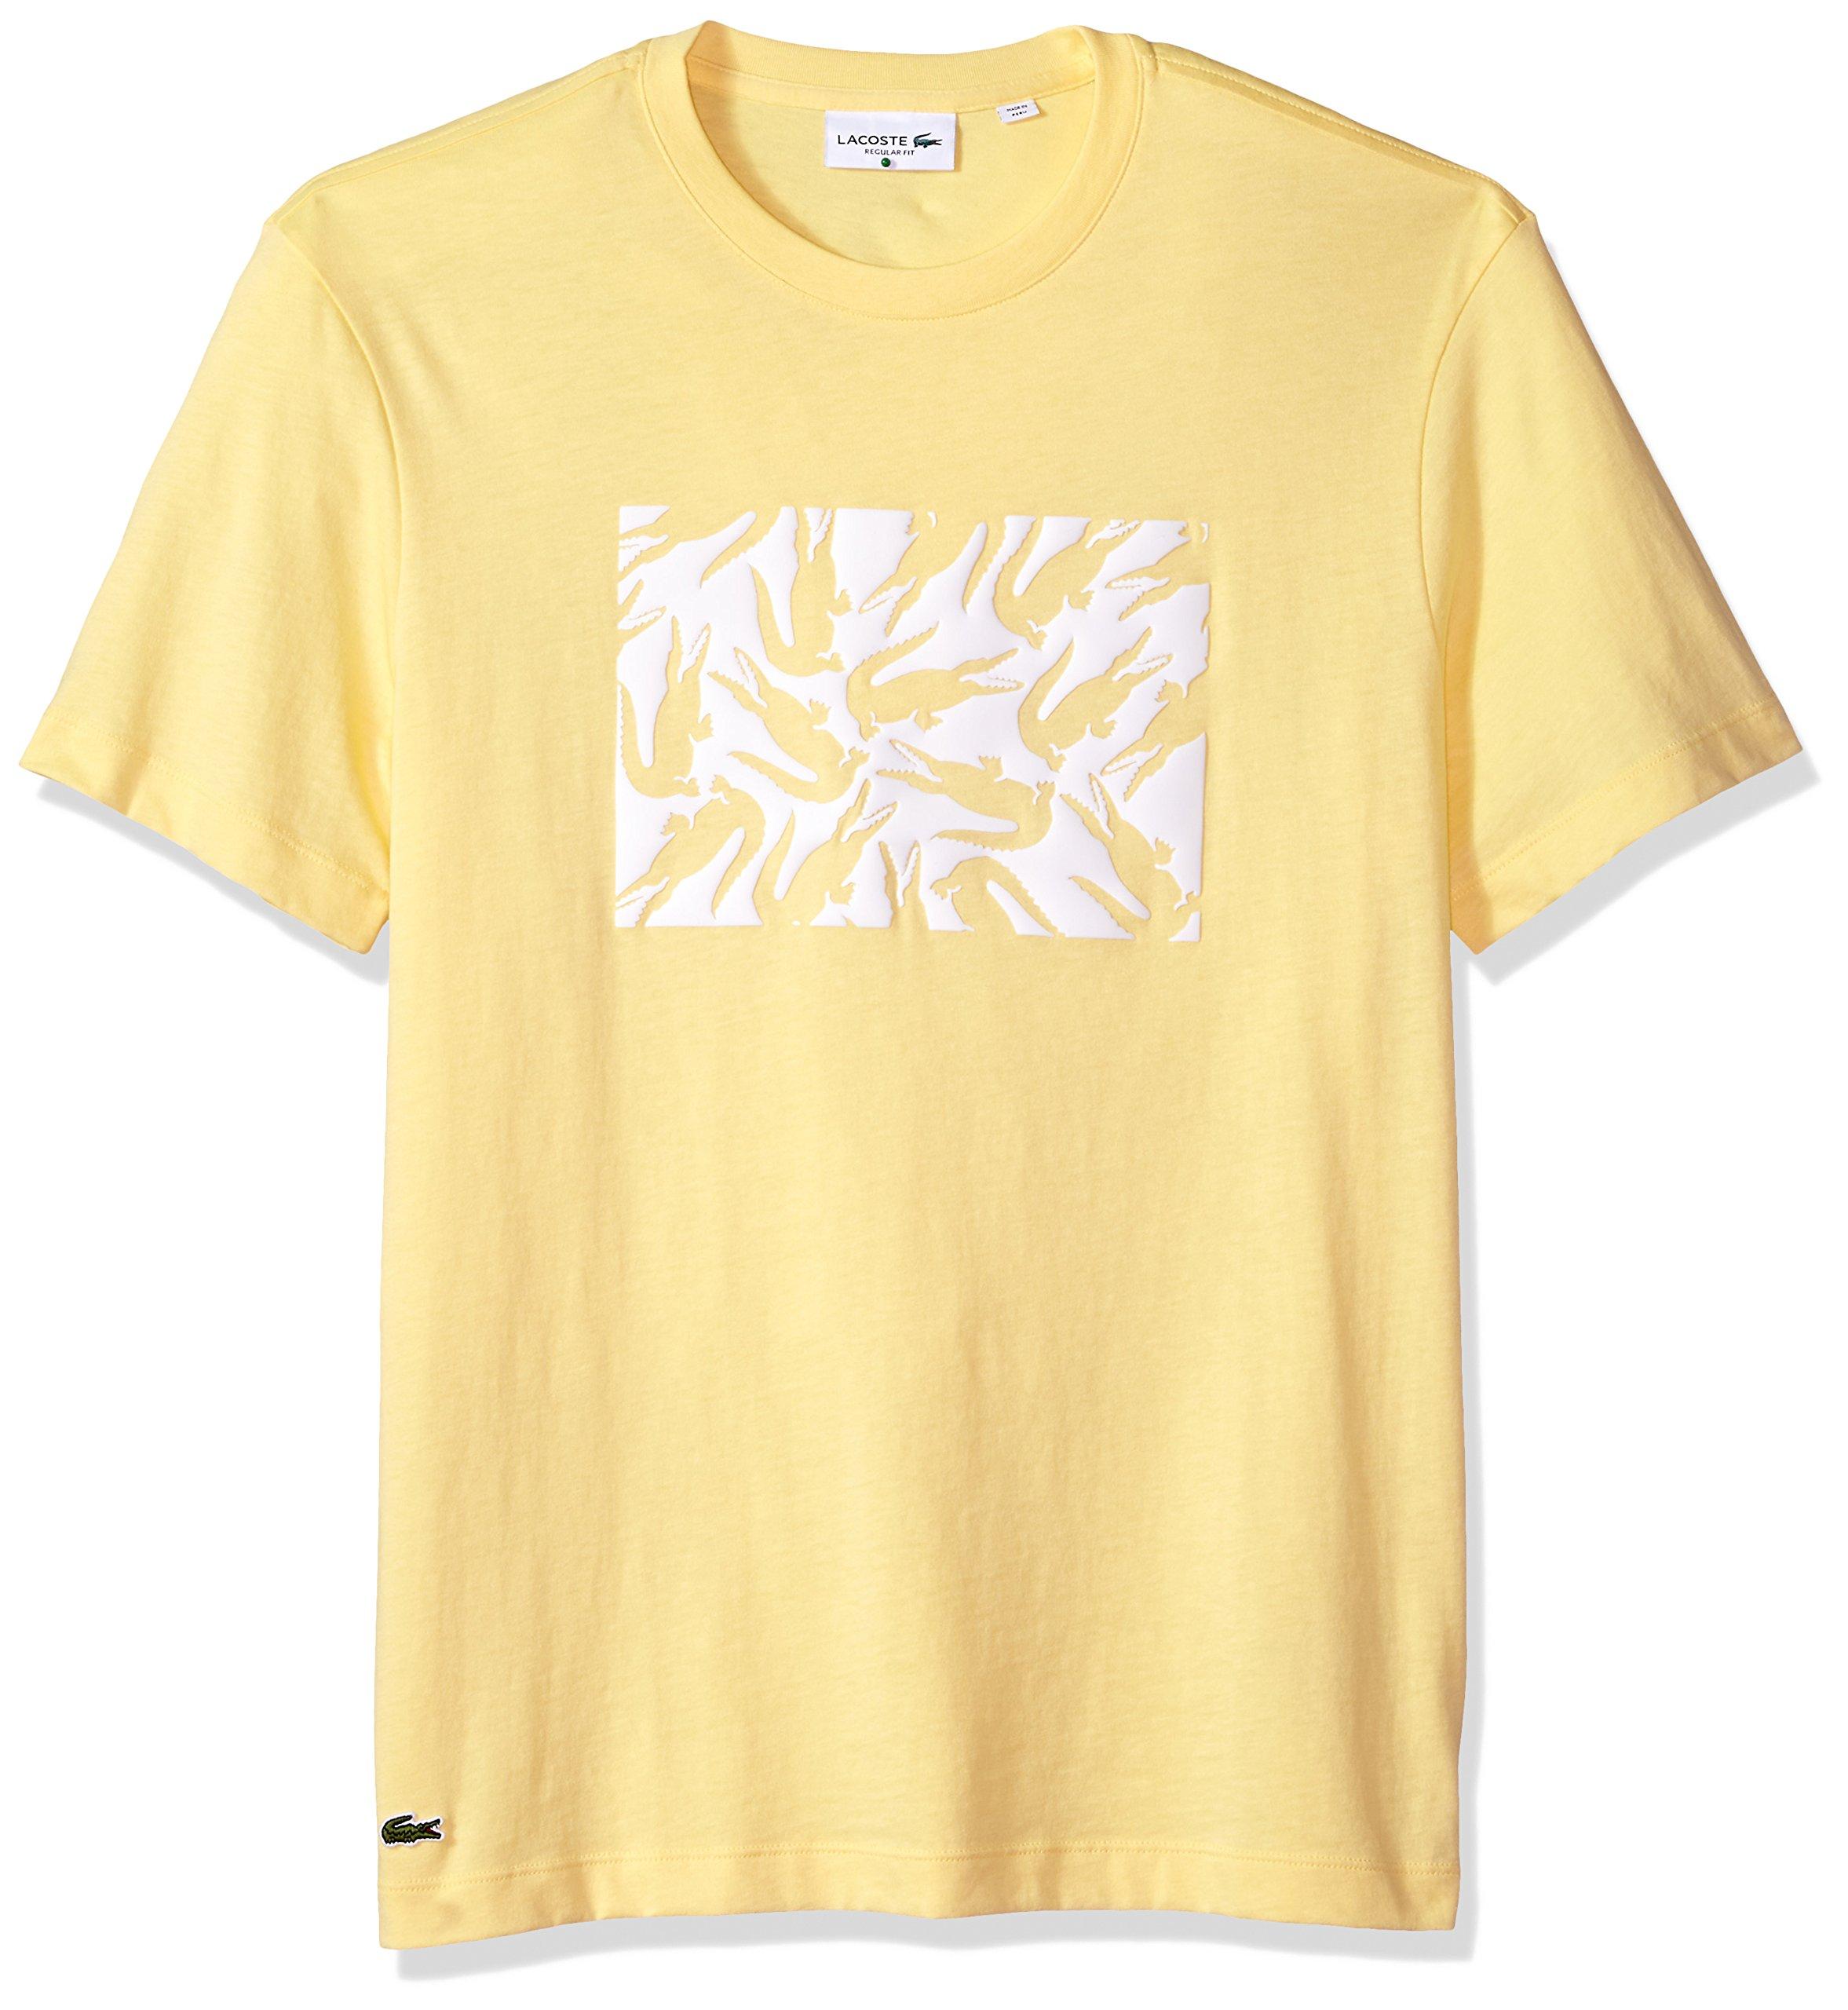 496cd83ba8420e Galleon - Lacoste Men s Short Sleeve Jersey Multi Croc Regular Fit T-Shirt